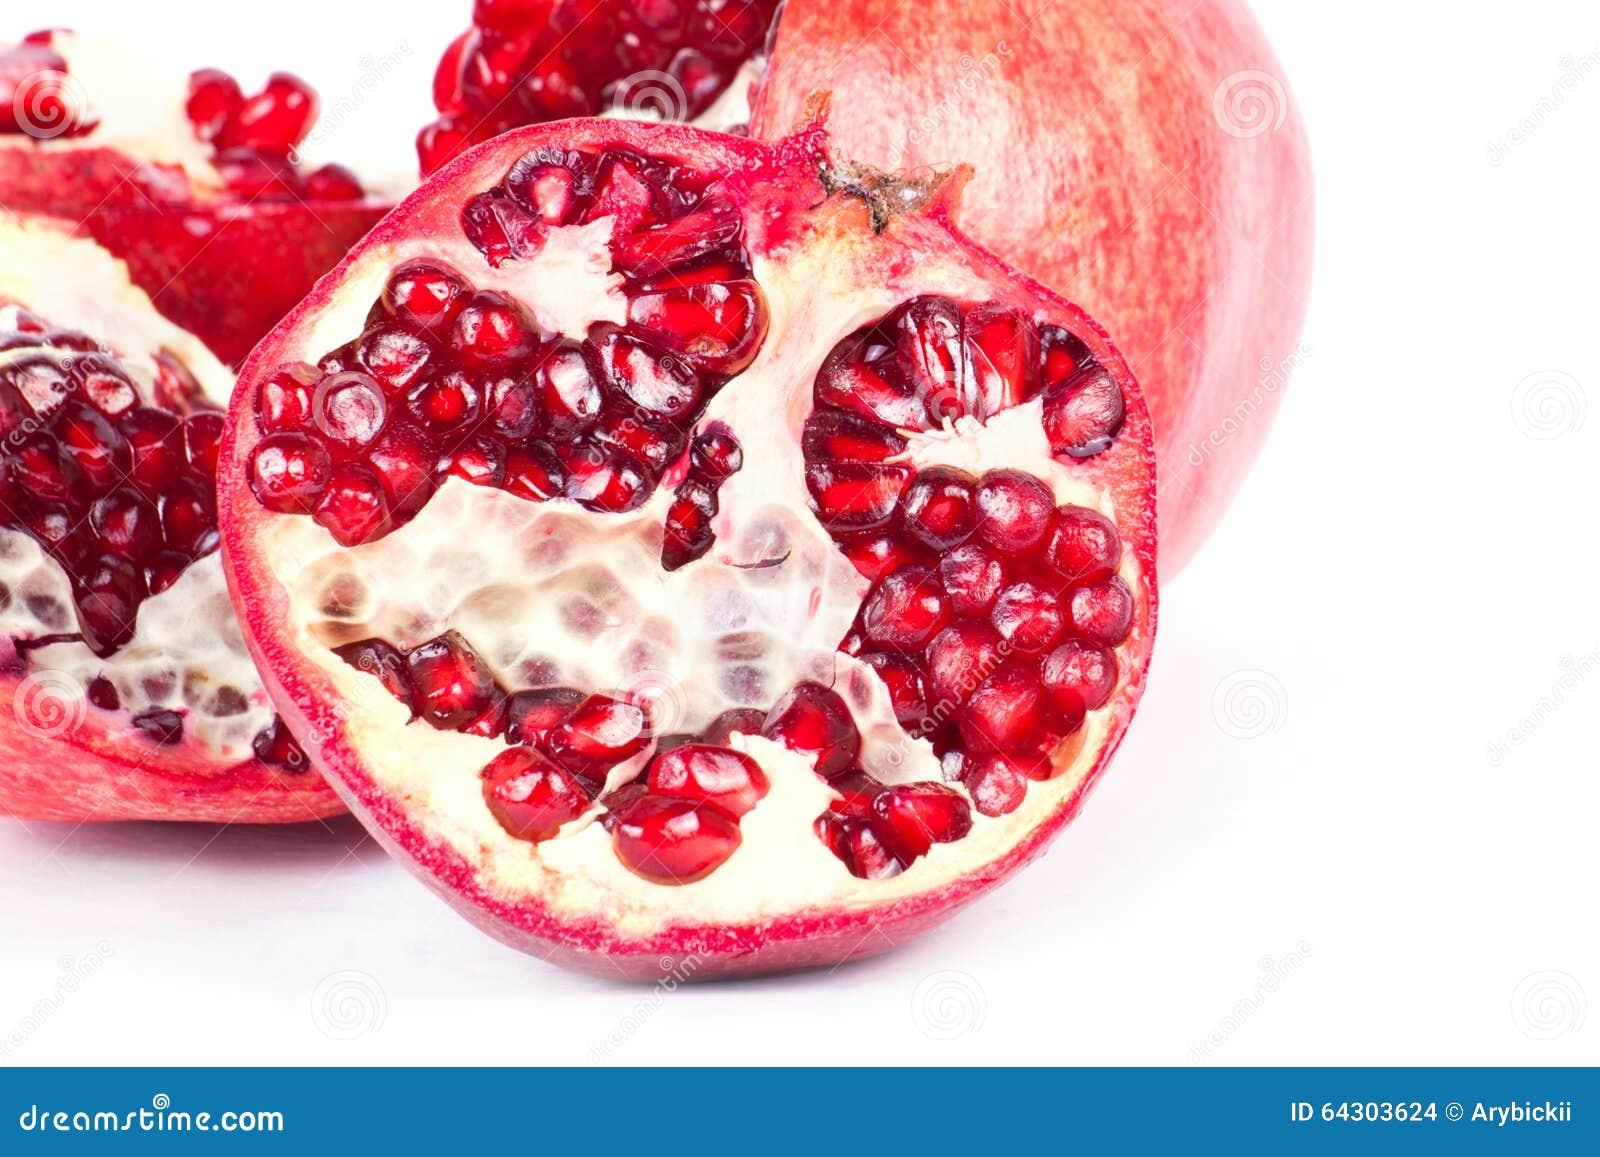 grenade de fruit m re photo stock image du mangez frais 64303624. Black Bedroom Furniture Sets. Home Design Ideas